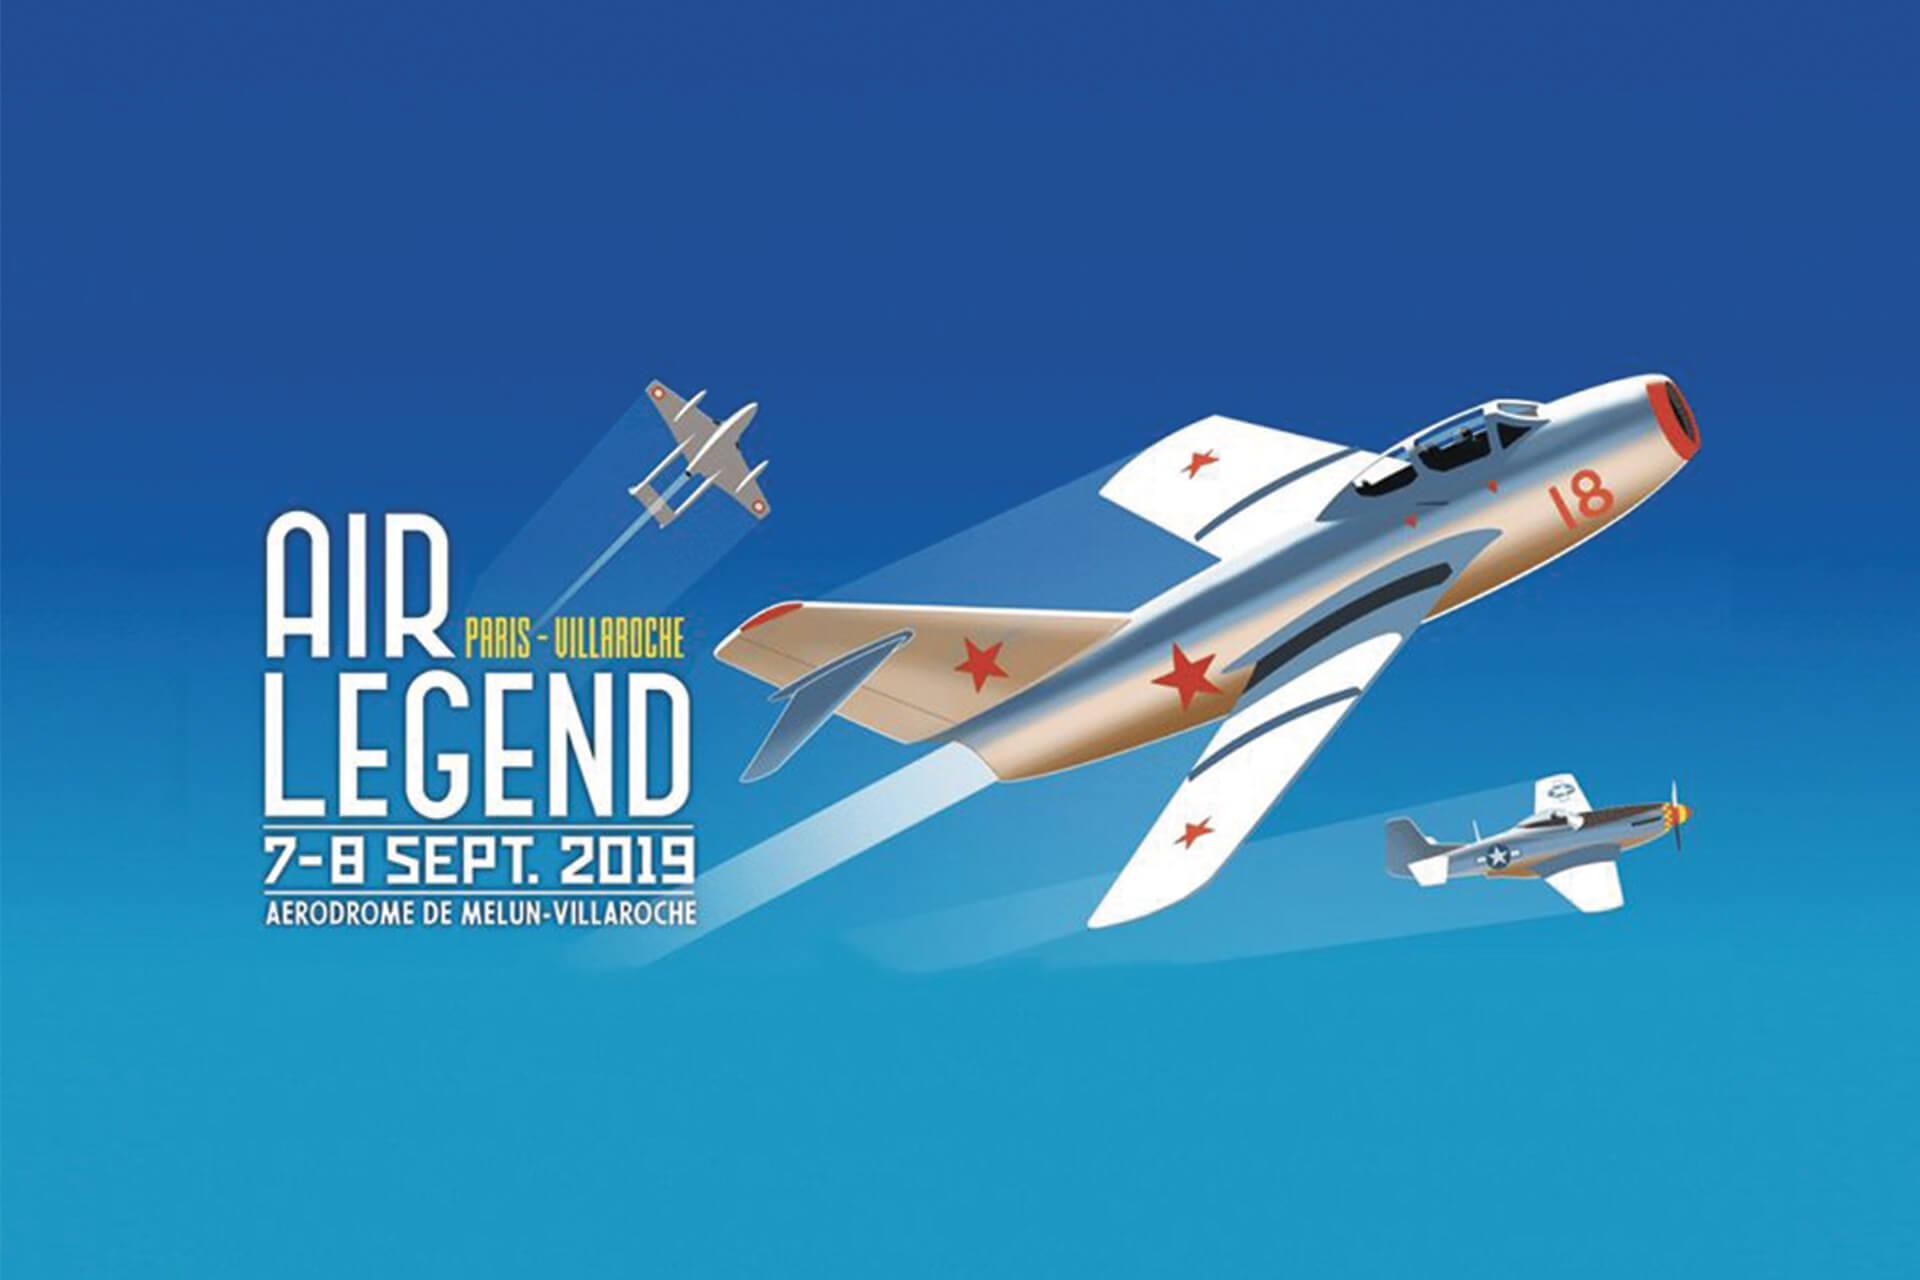 Paris Air Legend